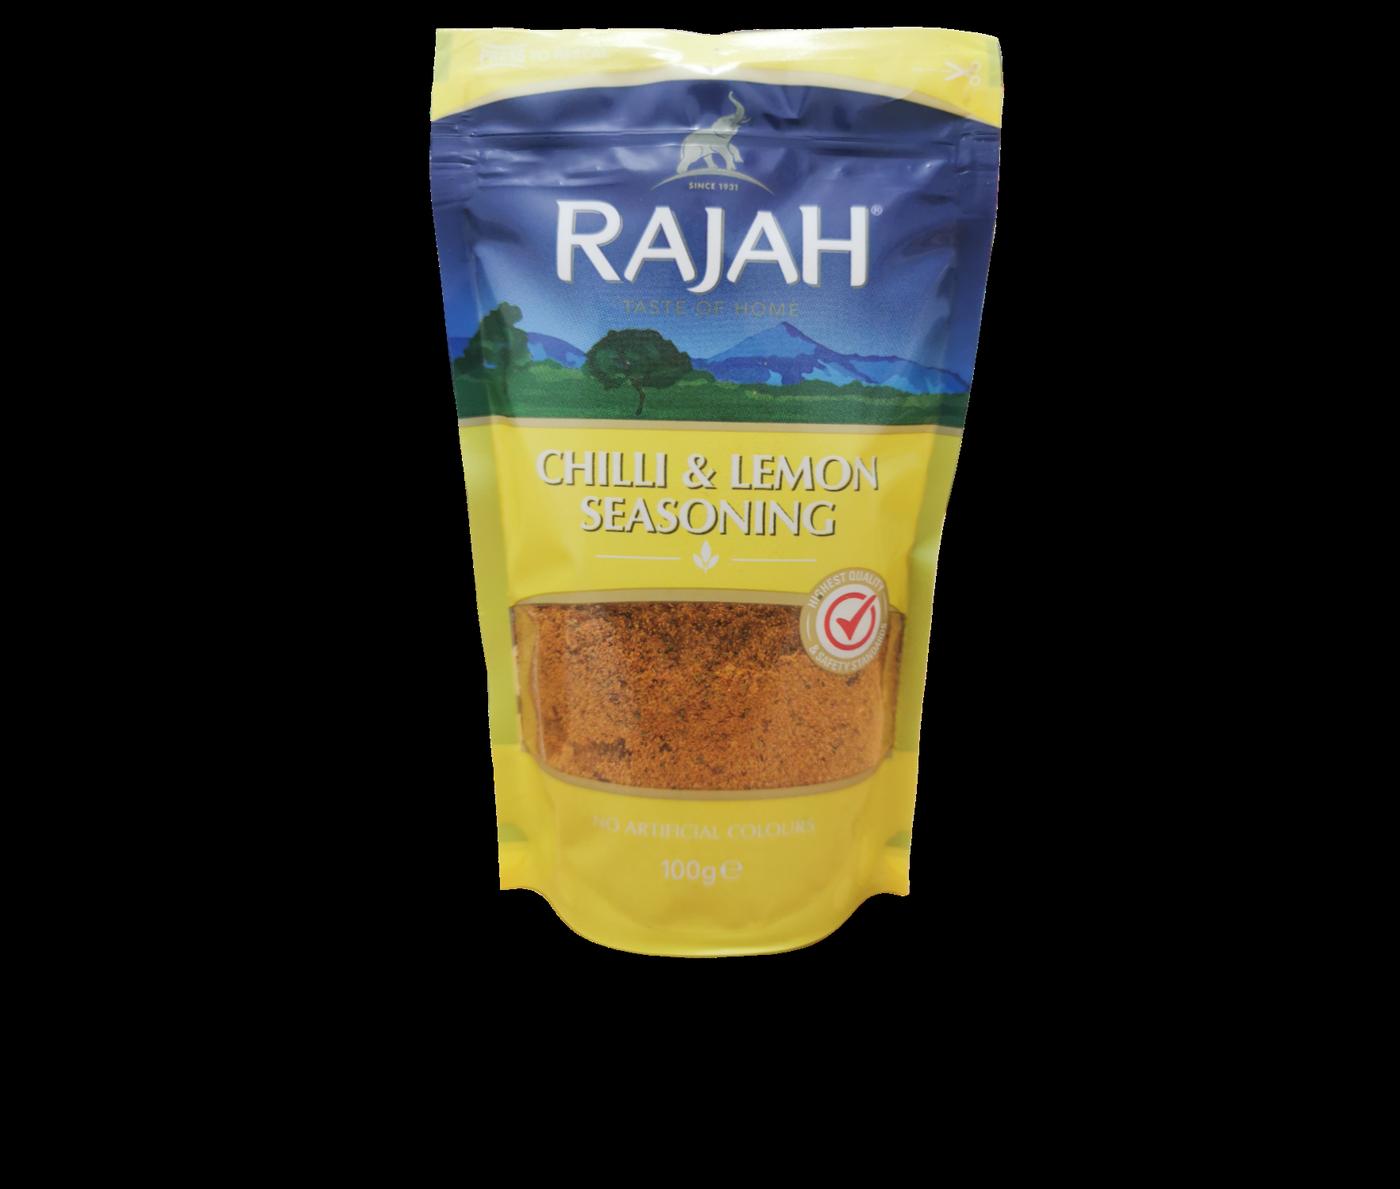 Rajah Chilli & Lemon Seasoning